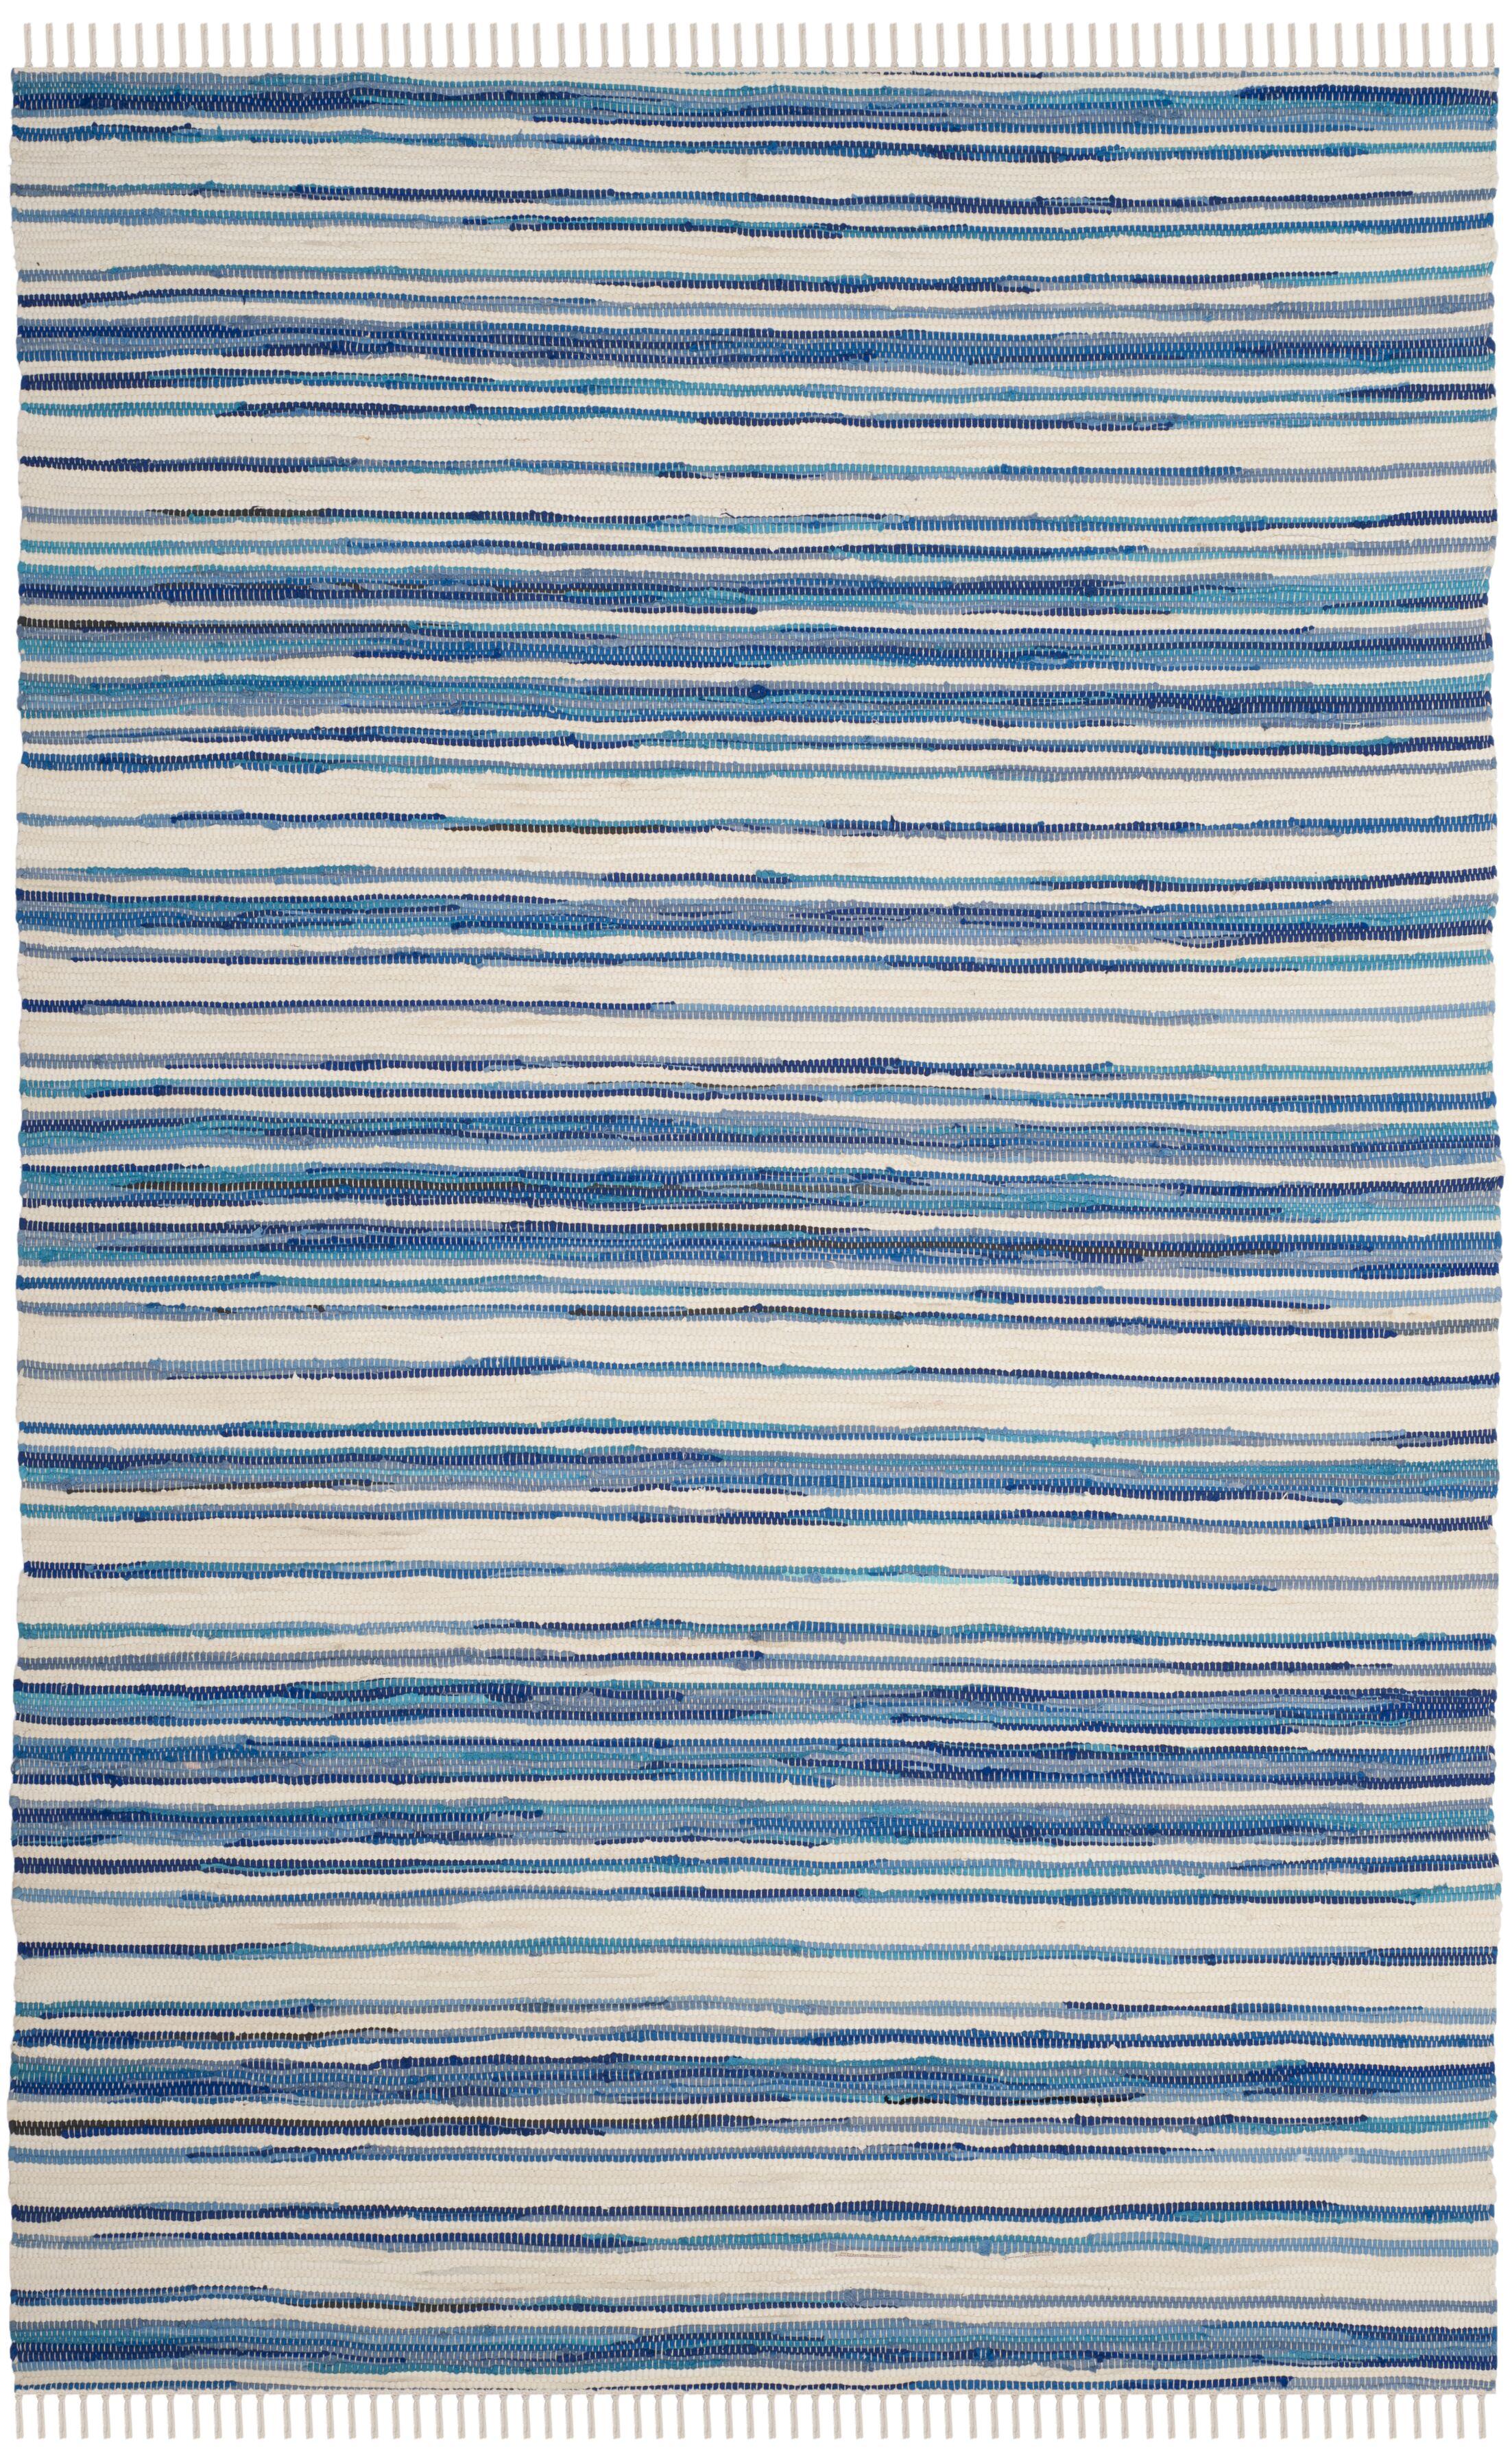 Shinn Hand-Woven Ivory/Blue Area Rug Rug Size: Rectangle 10' x 14'